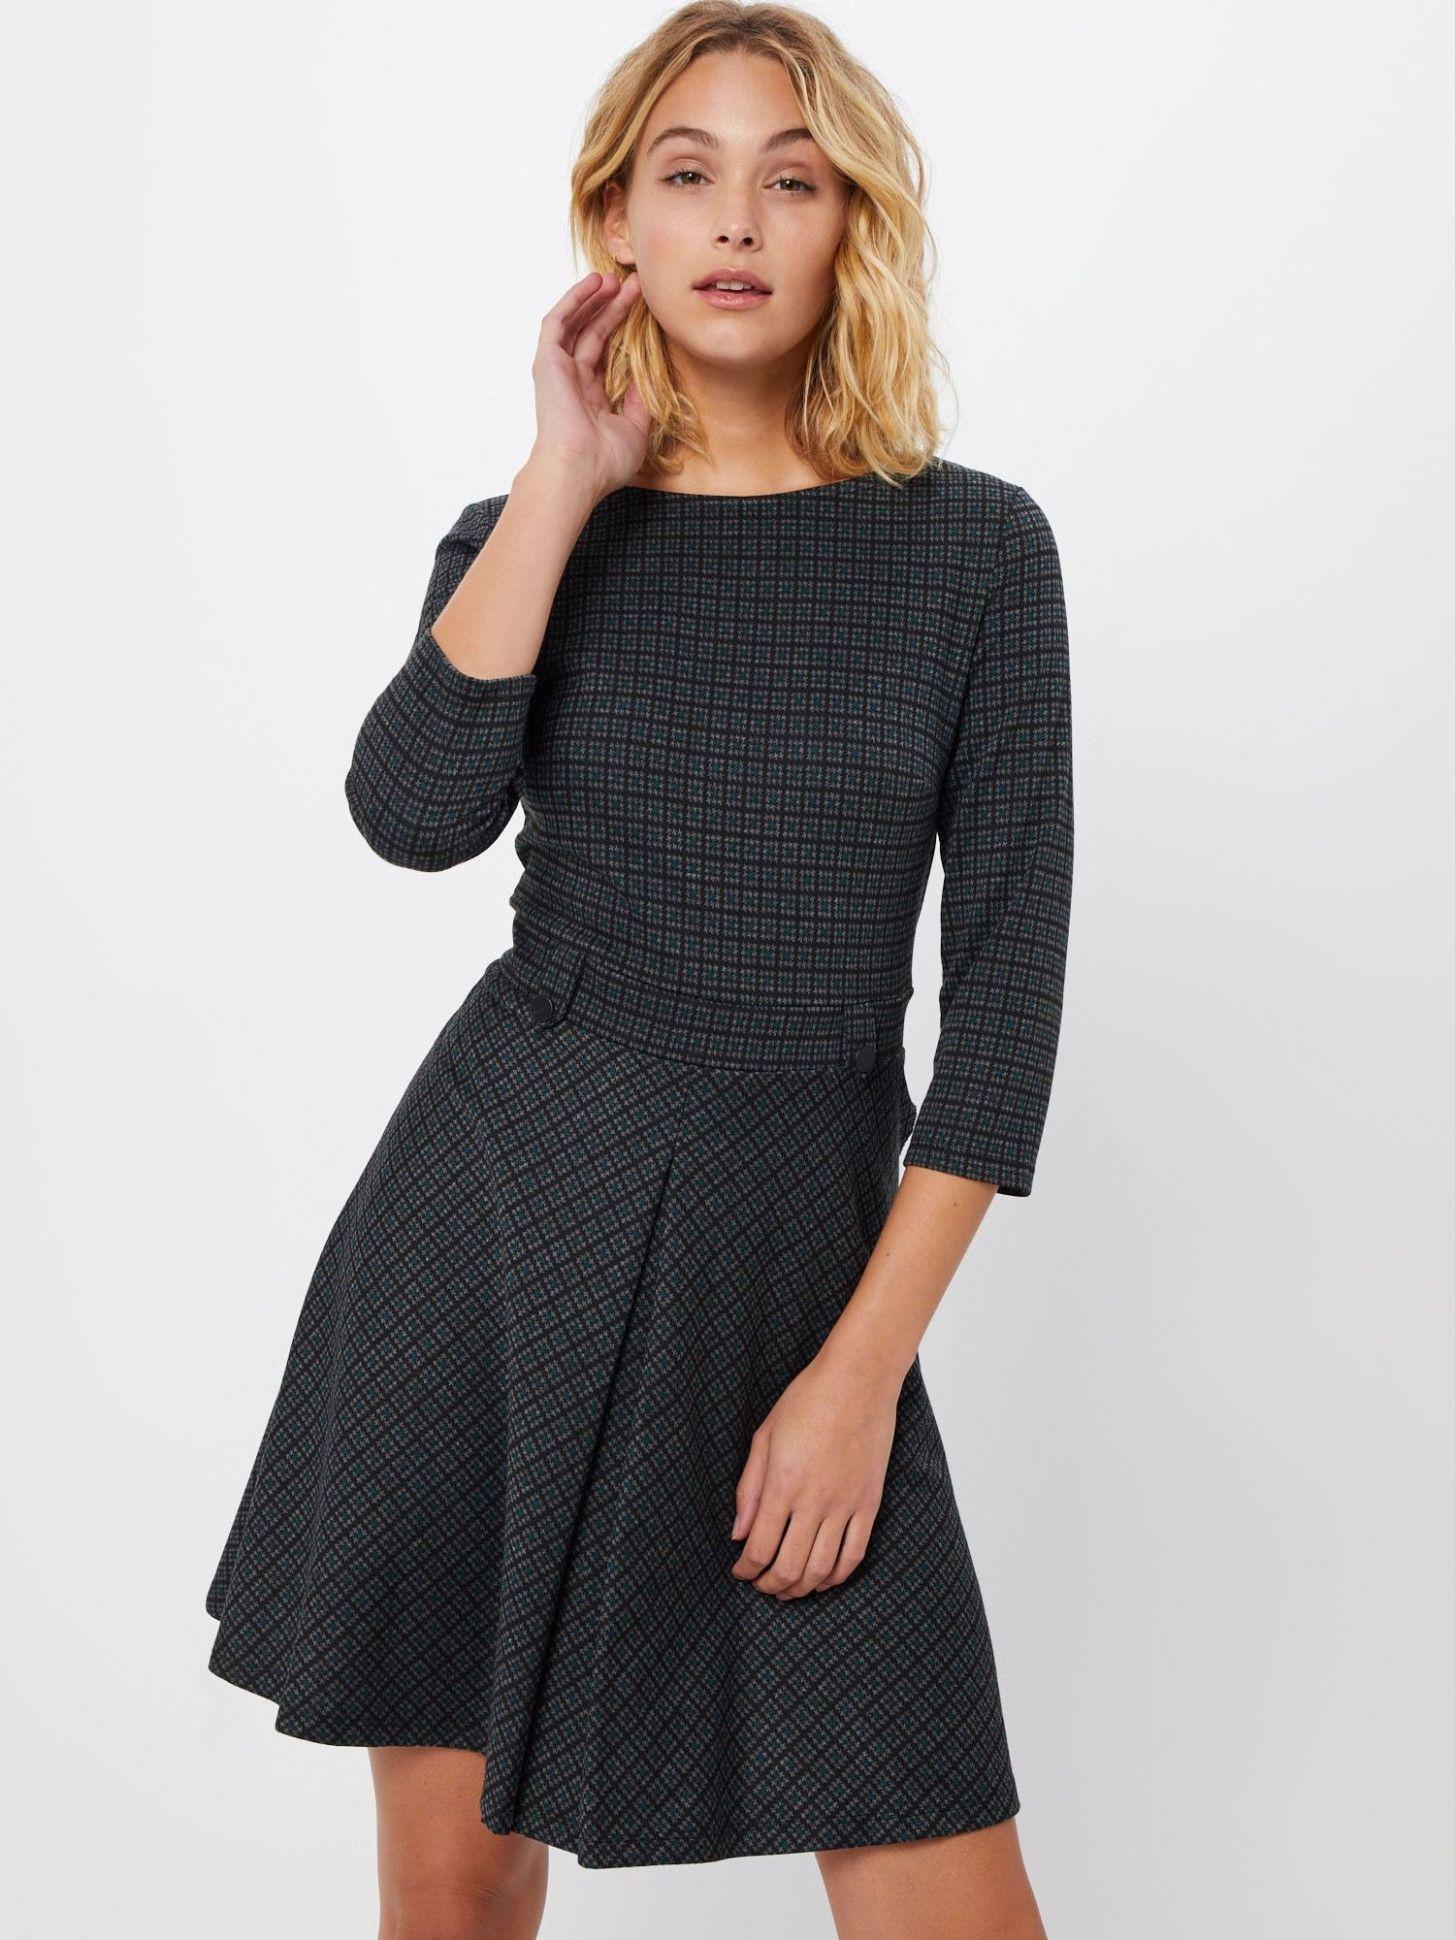 15 Kleidergröße 44 | Kleider größe 44, Strickkleid ...